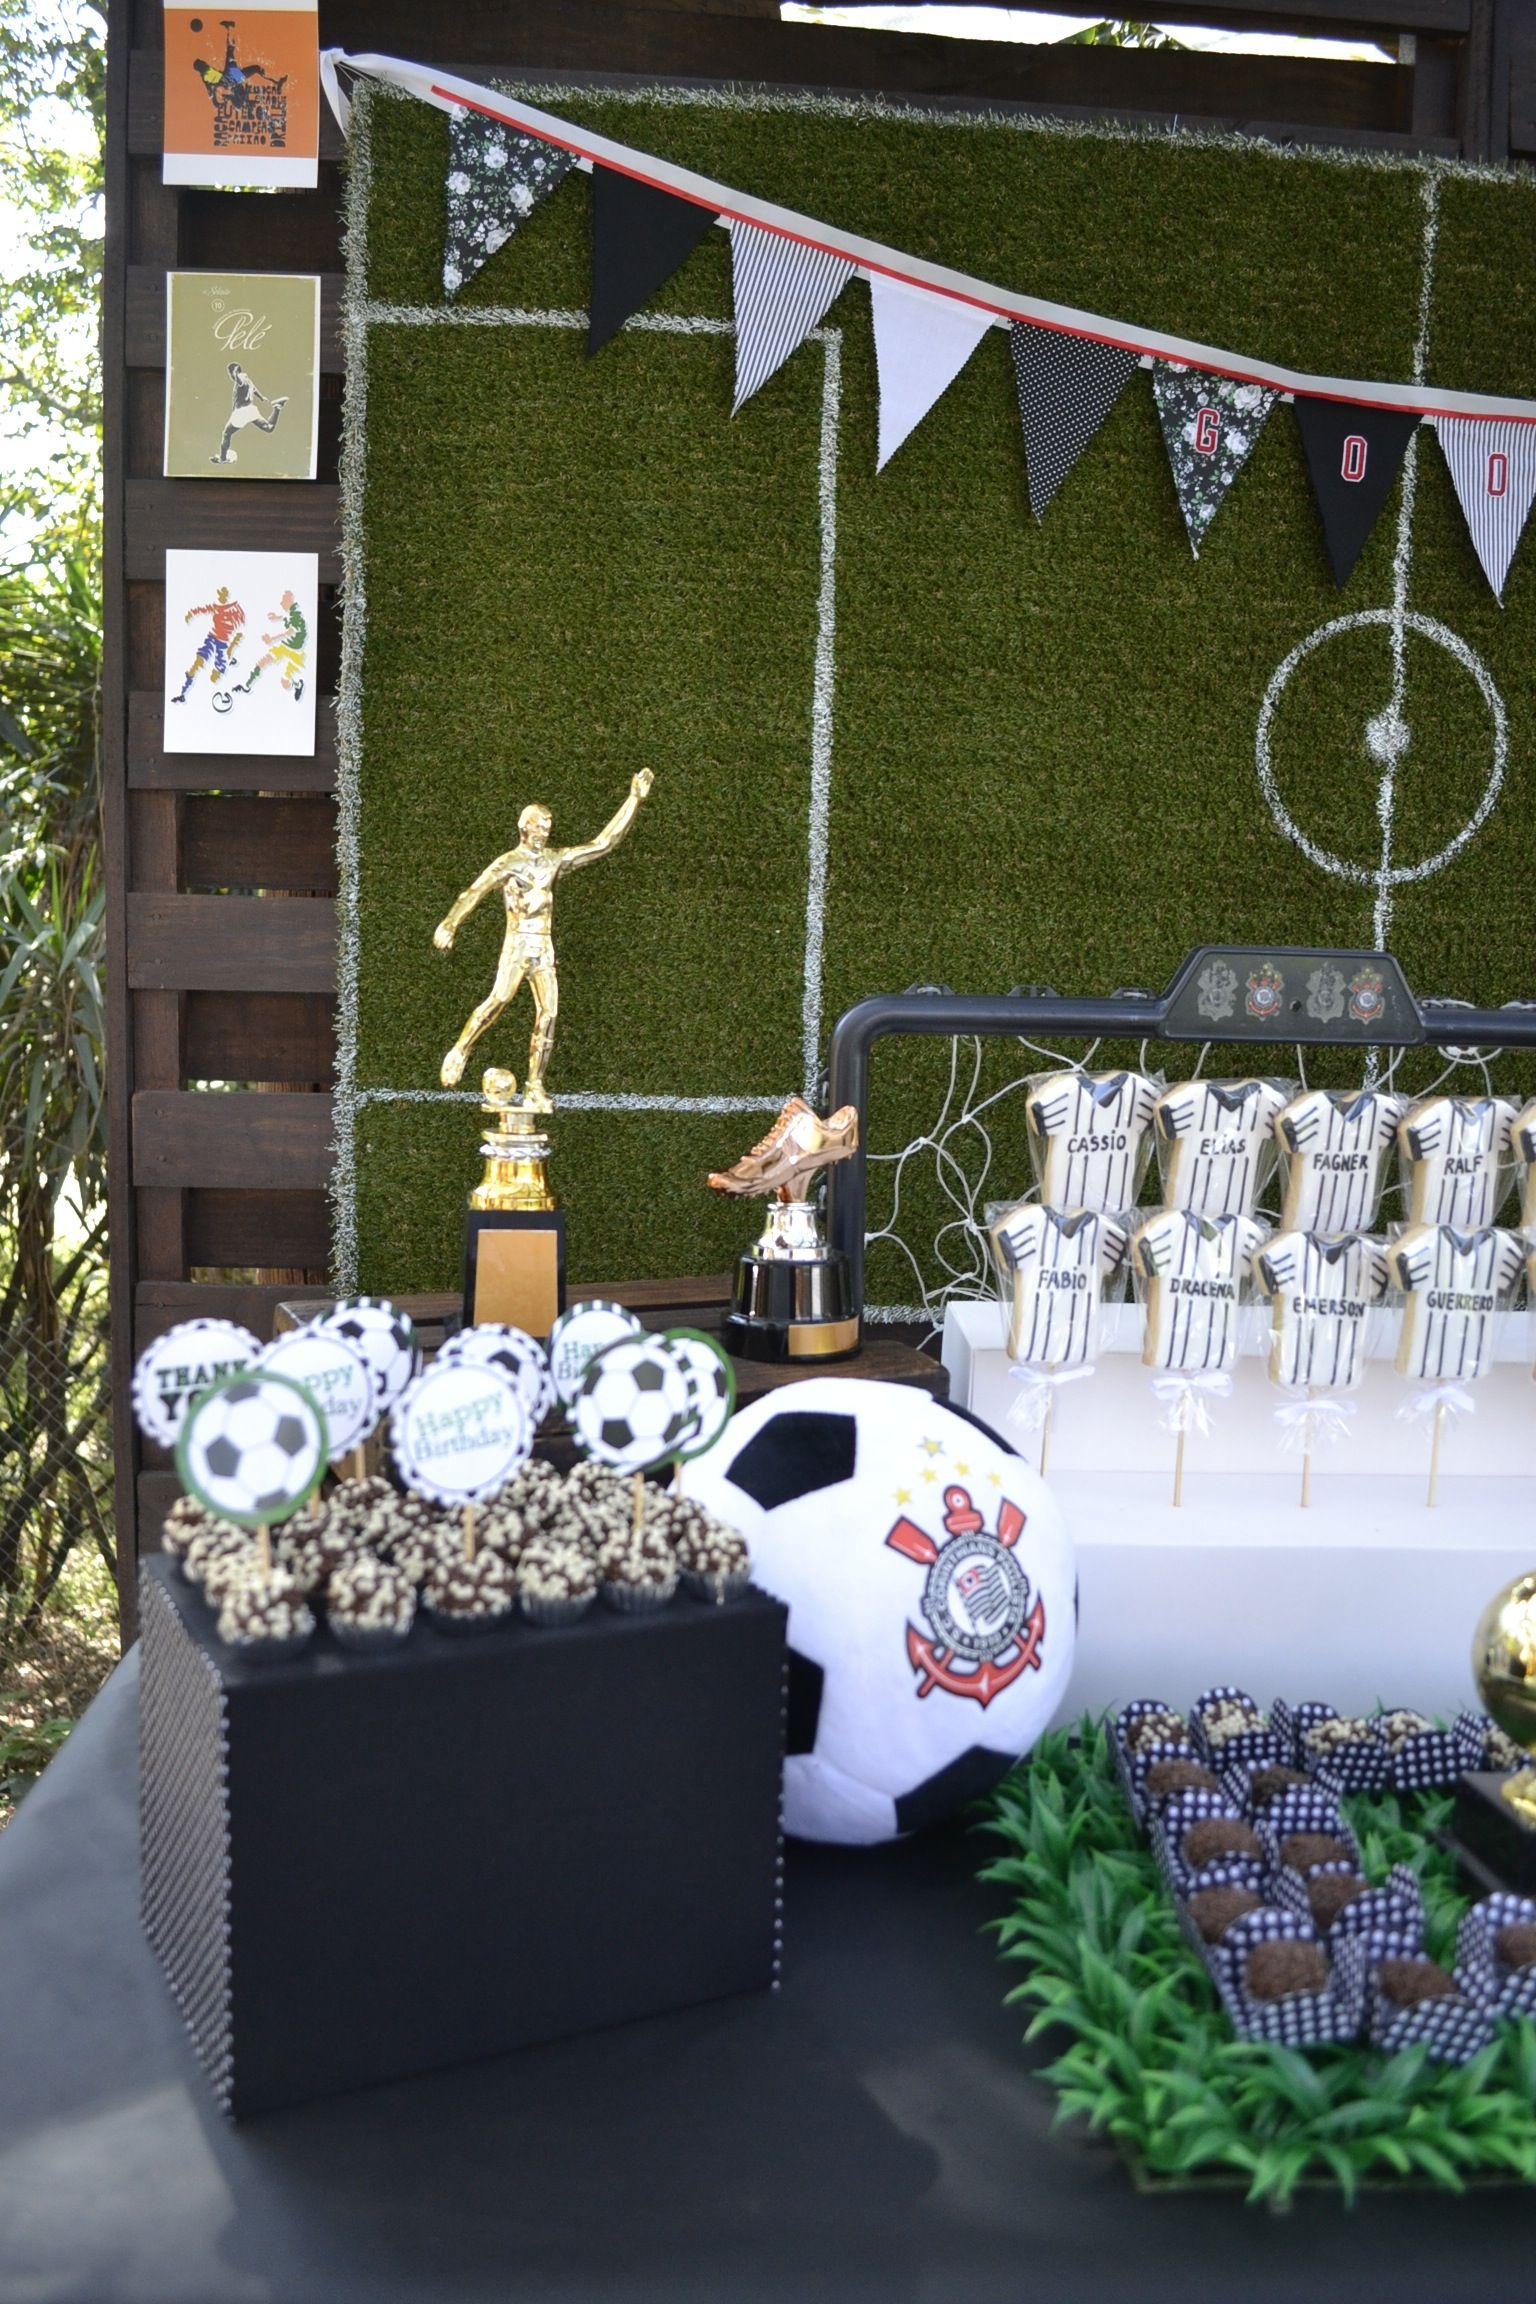 Informaa Aµes Festa De Aniversario De Futebol Festa De Futebol